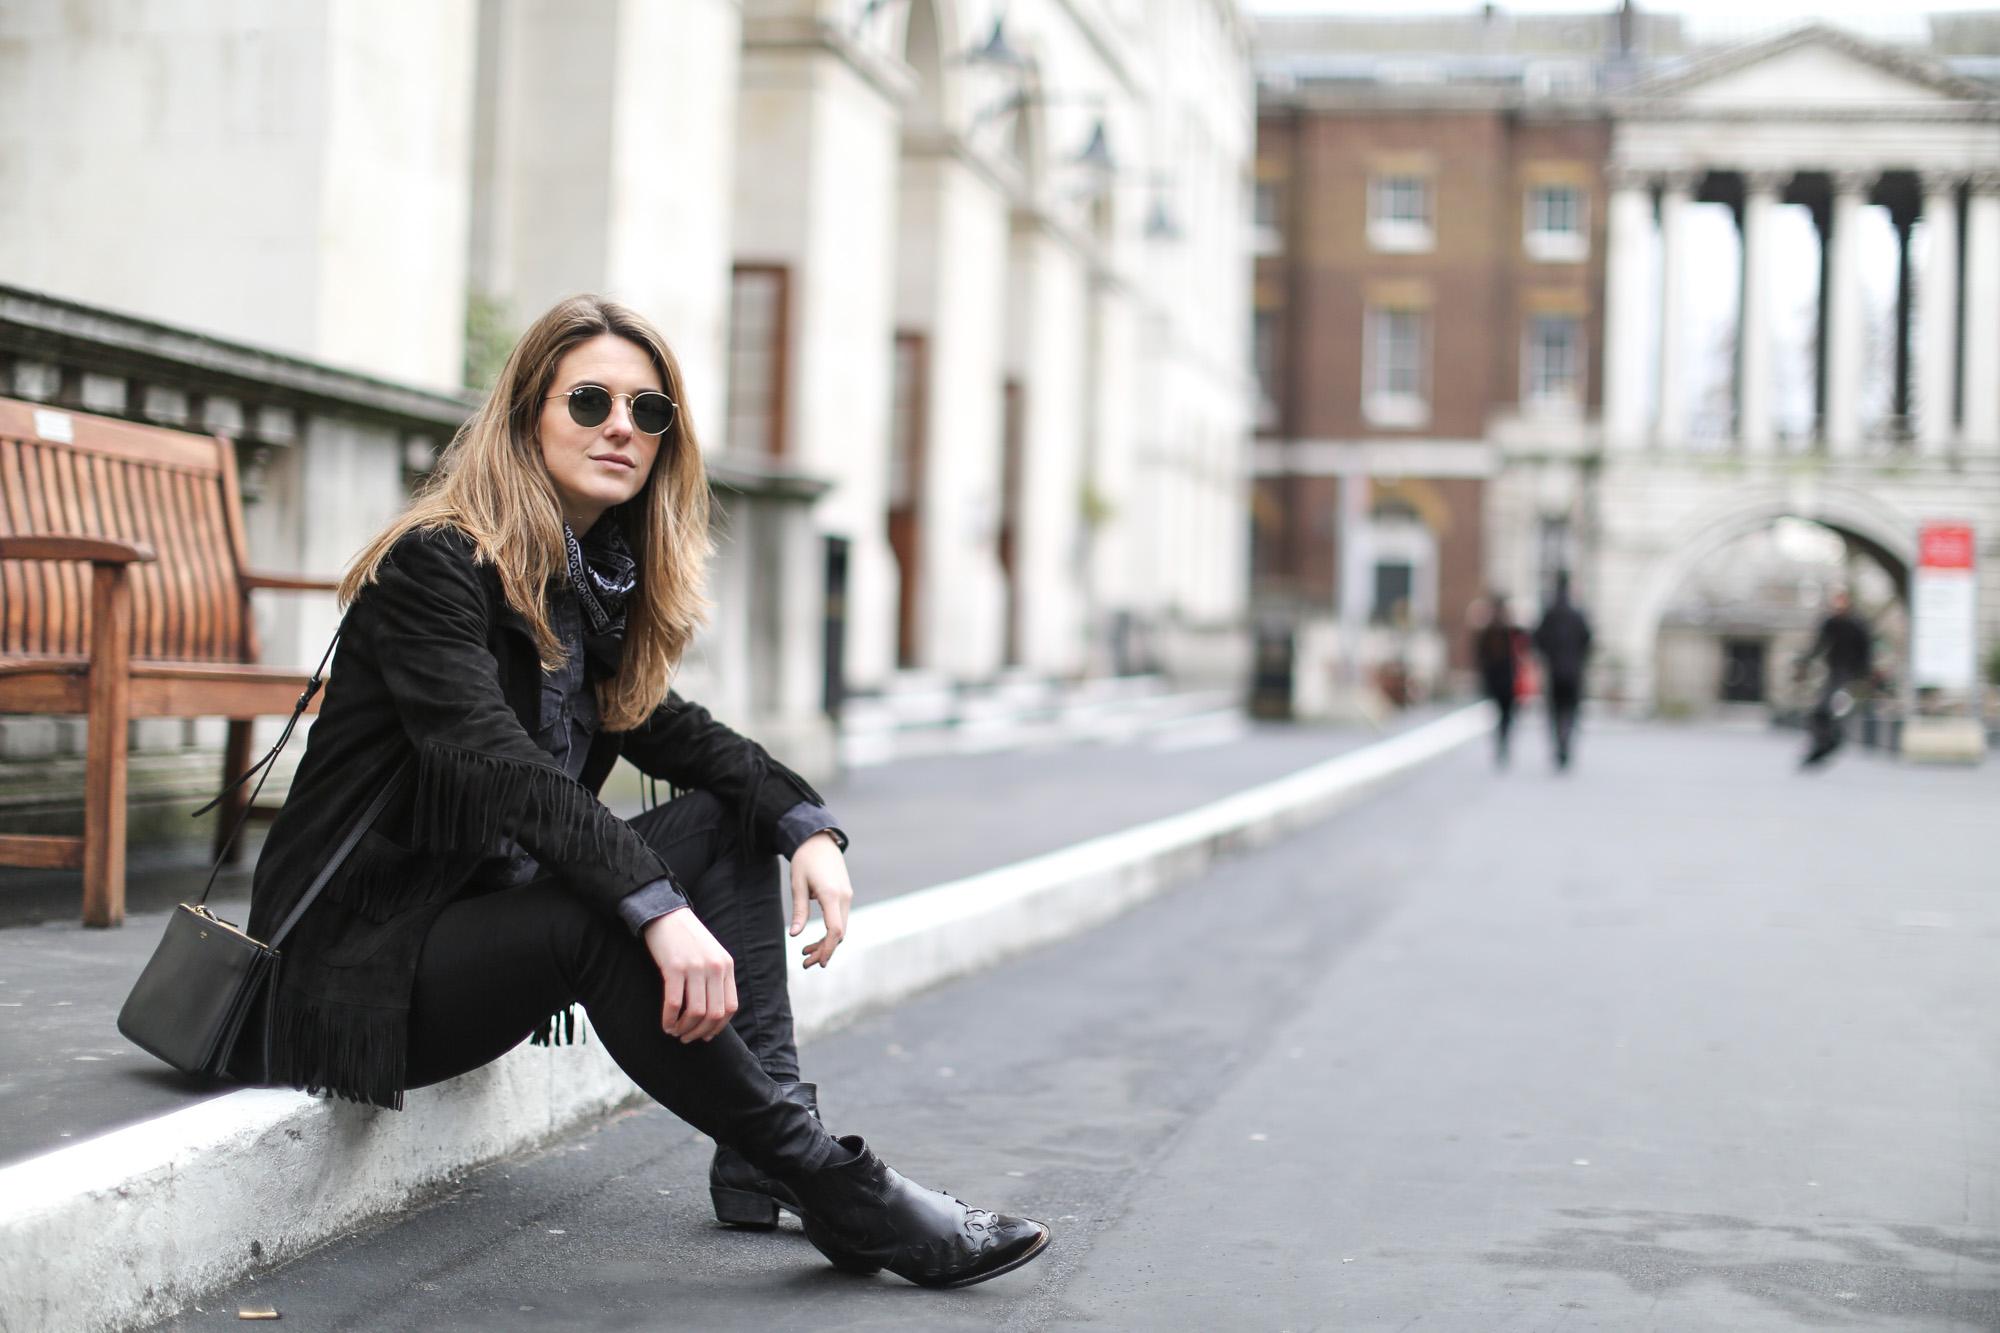 Clochet-streetstyle-lfw-london-fashion-week-maje-fringed-suede-jacket-cowboy-boots-8